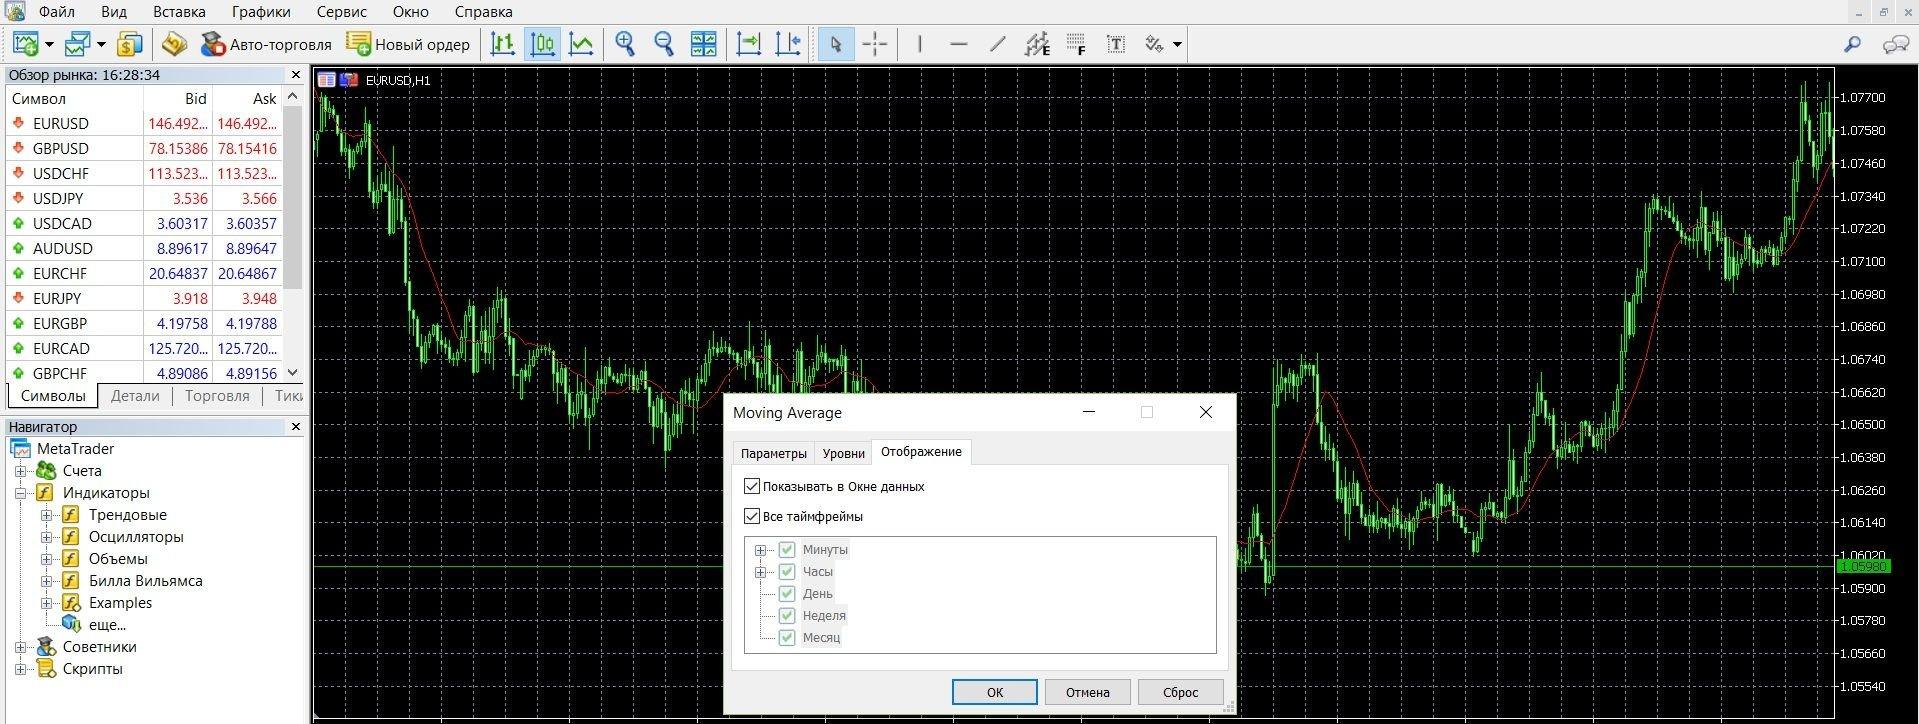 Установка параметров у осциллятора Moving Average